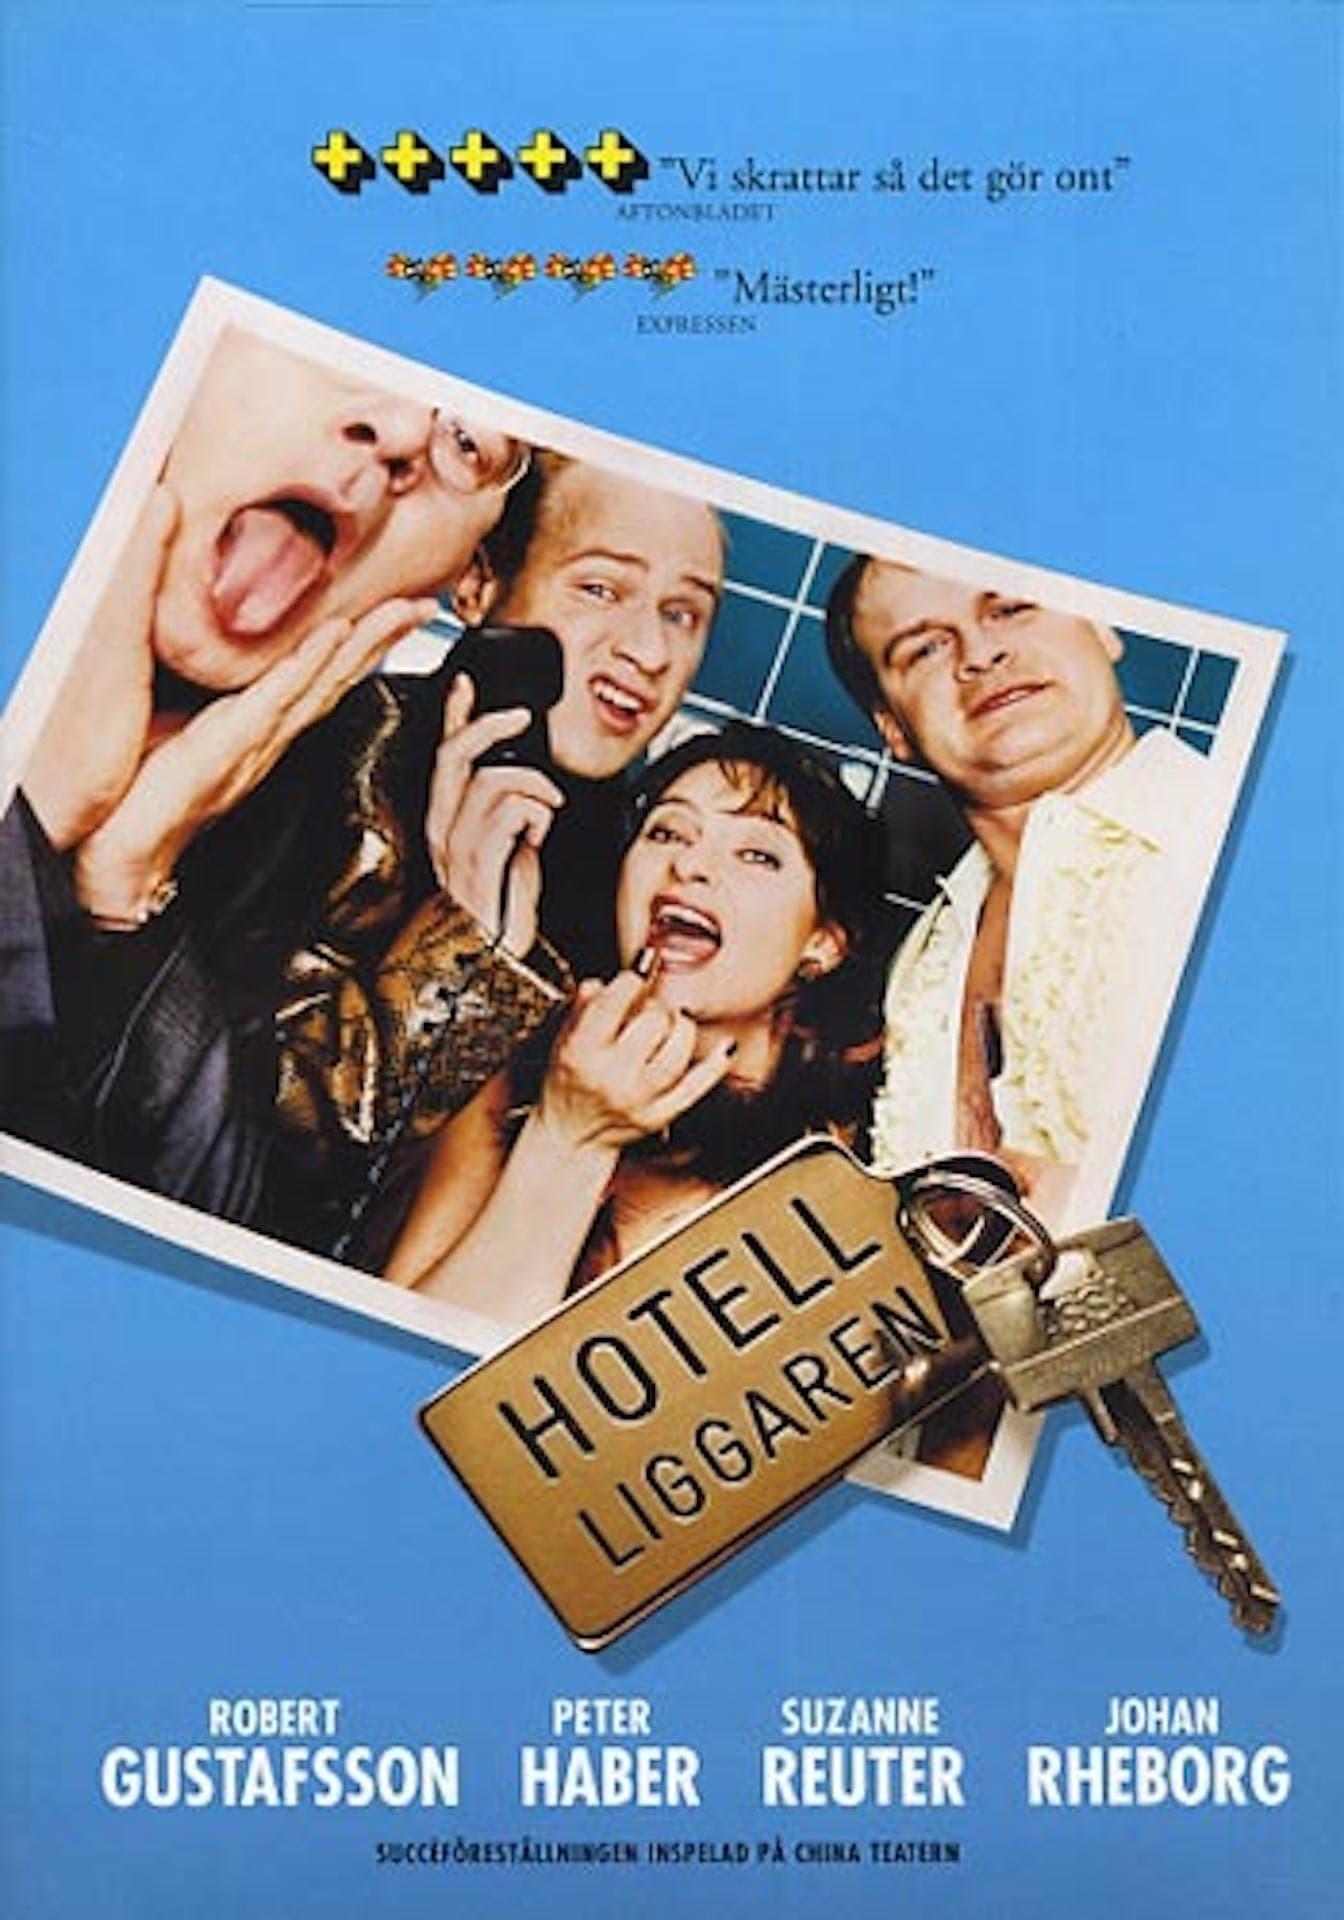 The Hotel Register